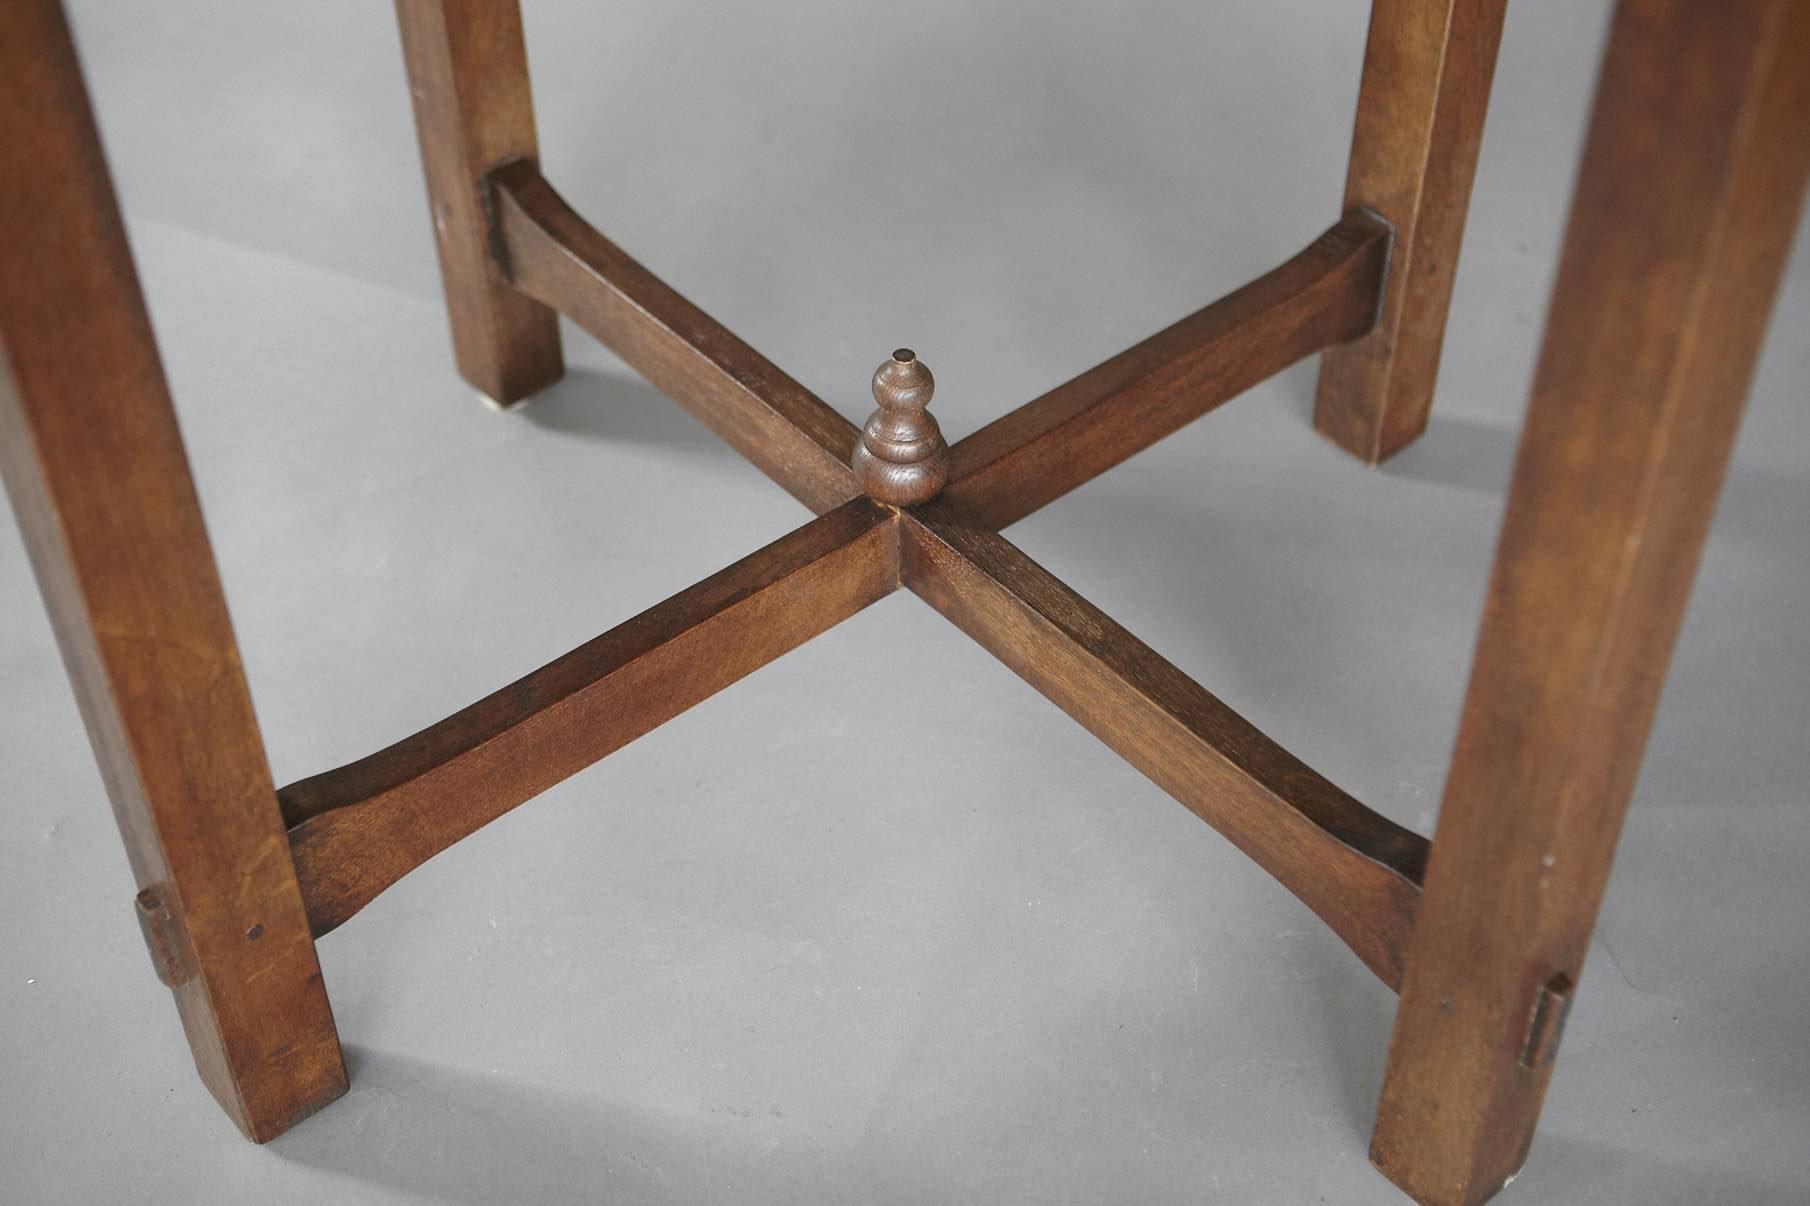 Antique oak arts crafts oak lamp table jens buettner design series0415 artsandcrafts round lamp table copy04 mg8785g geotapseo Choice Image